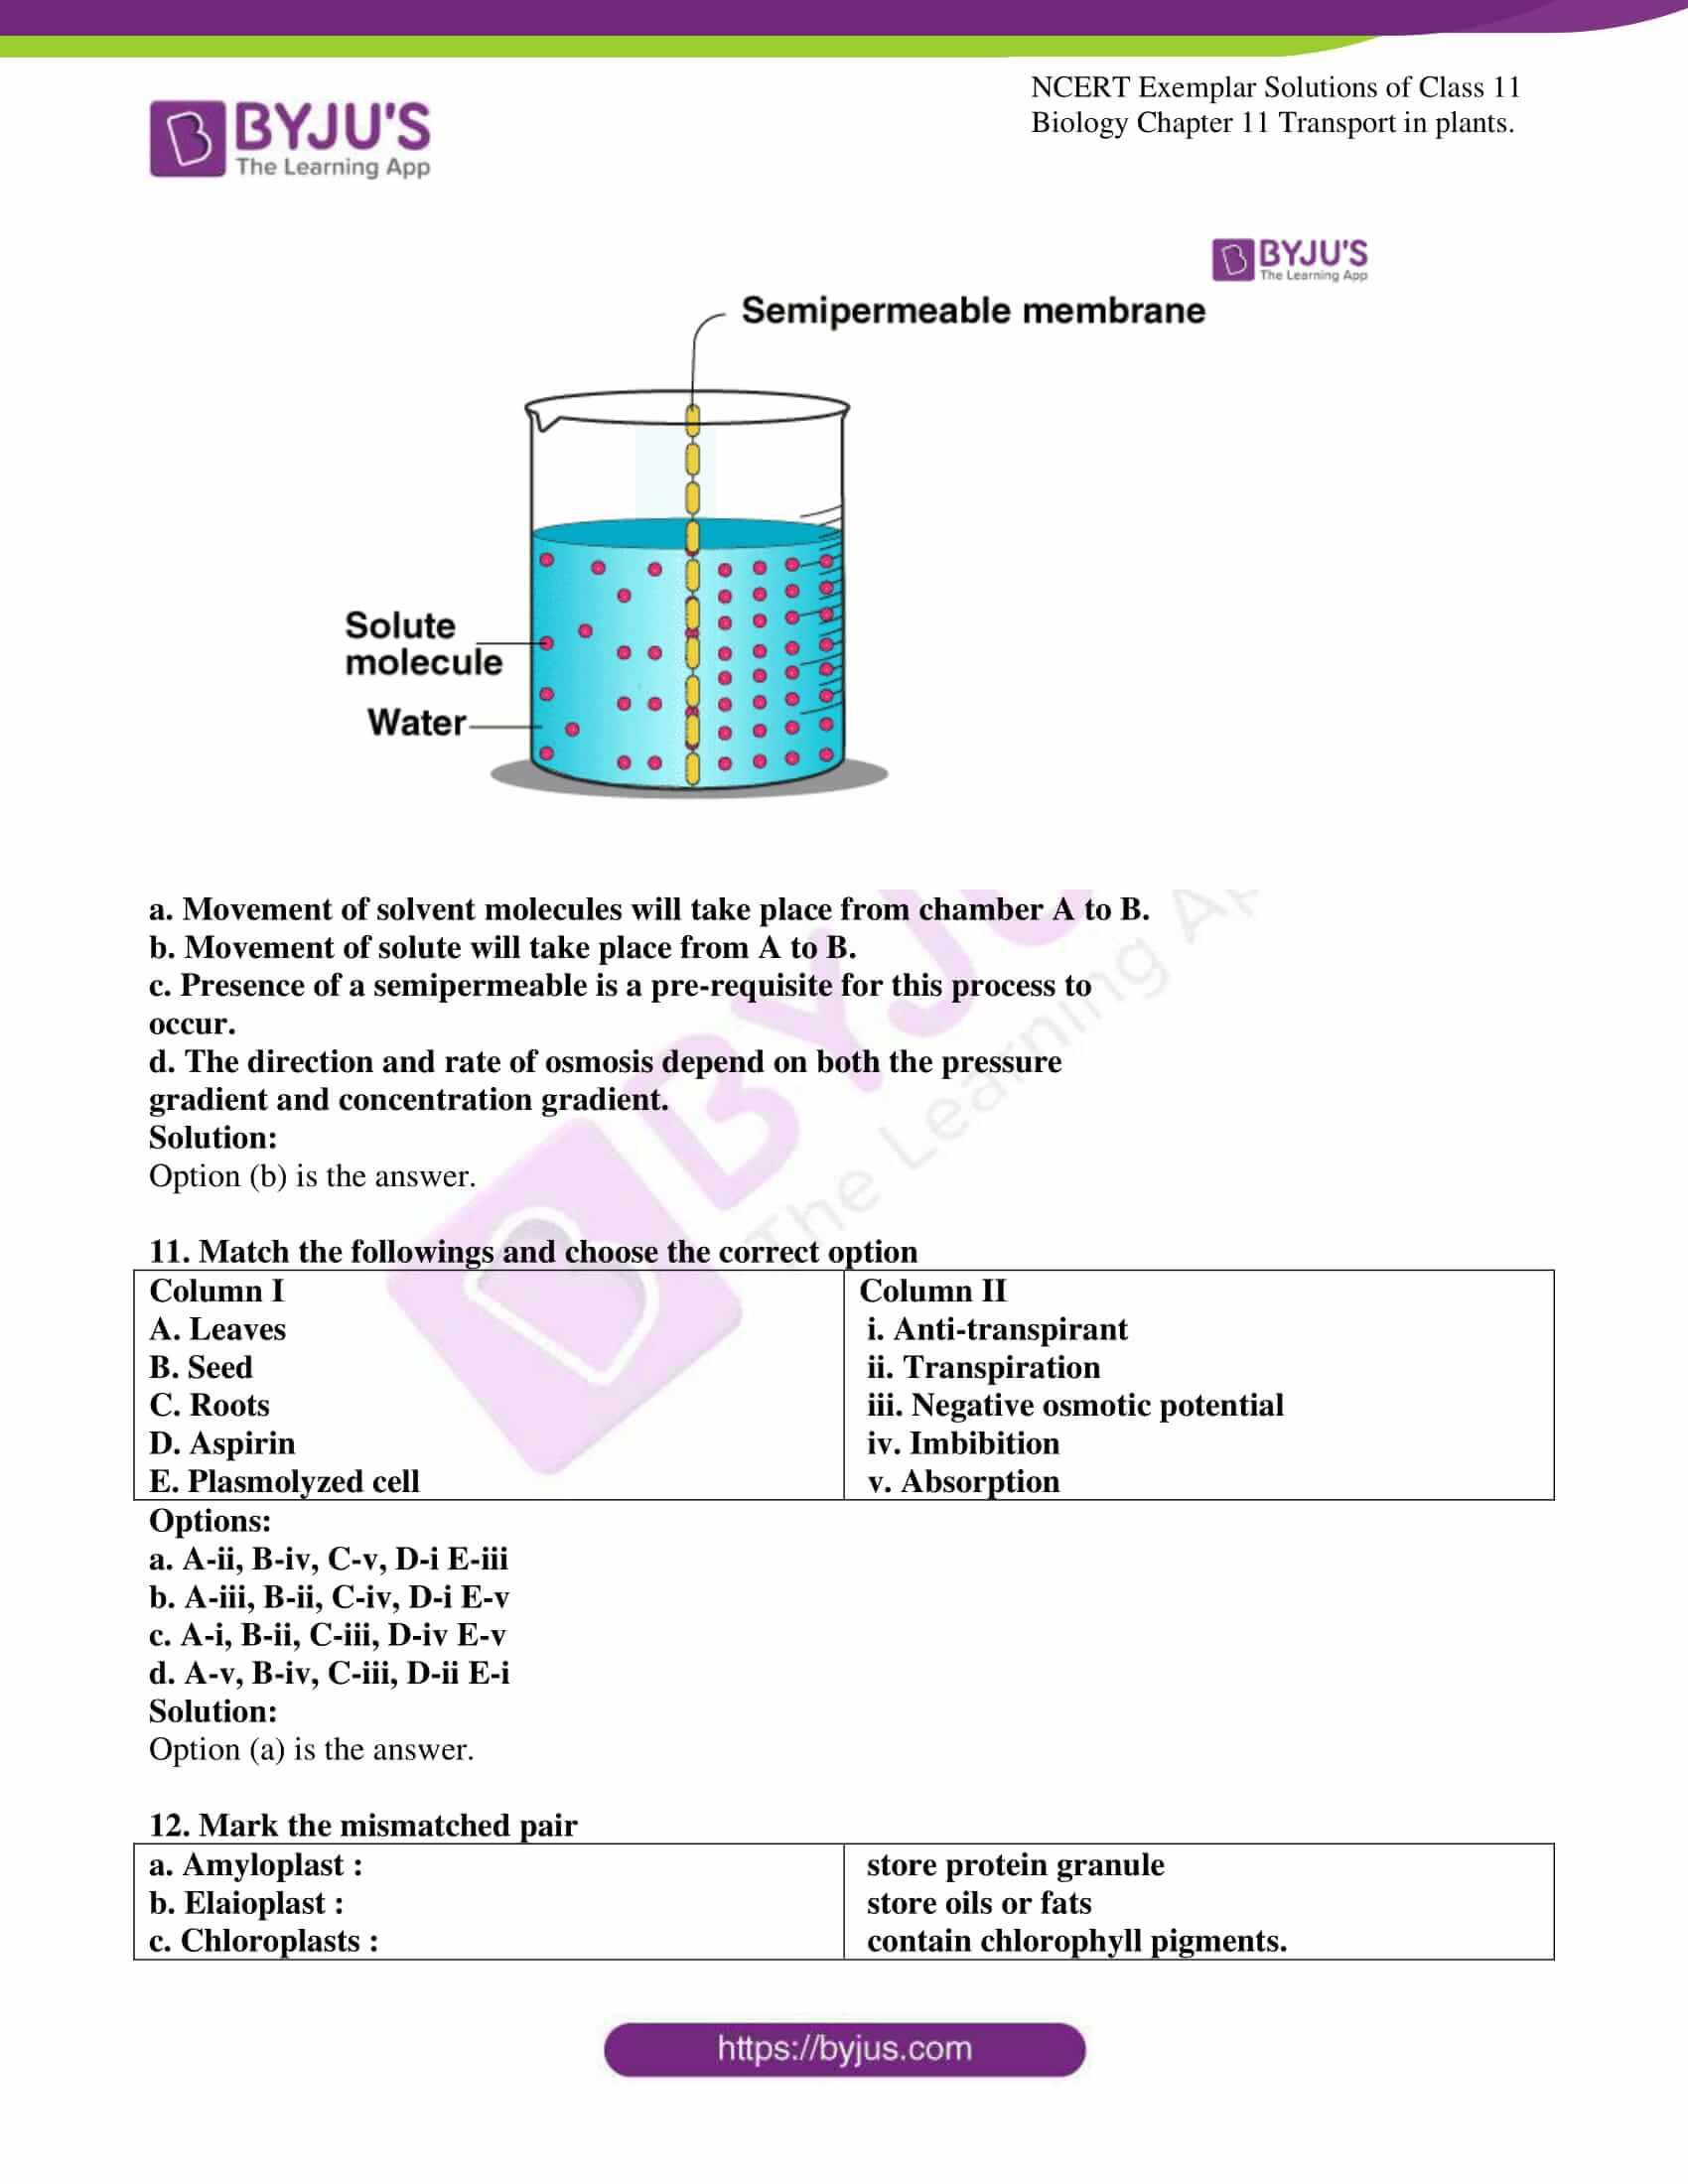 ncert exemplar solutions for class 11 bio chapter 11 03